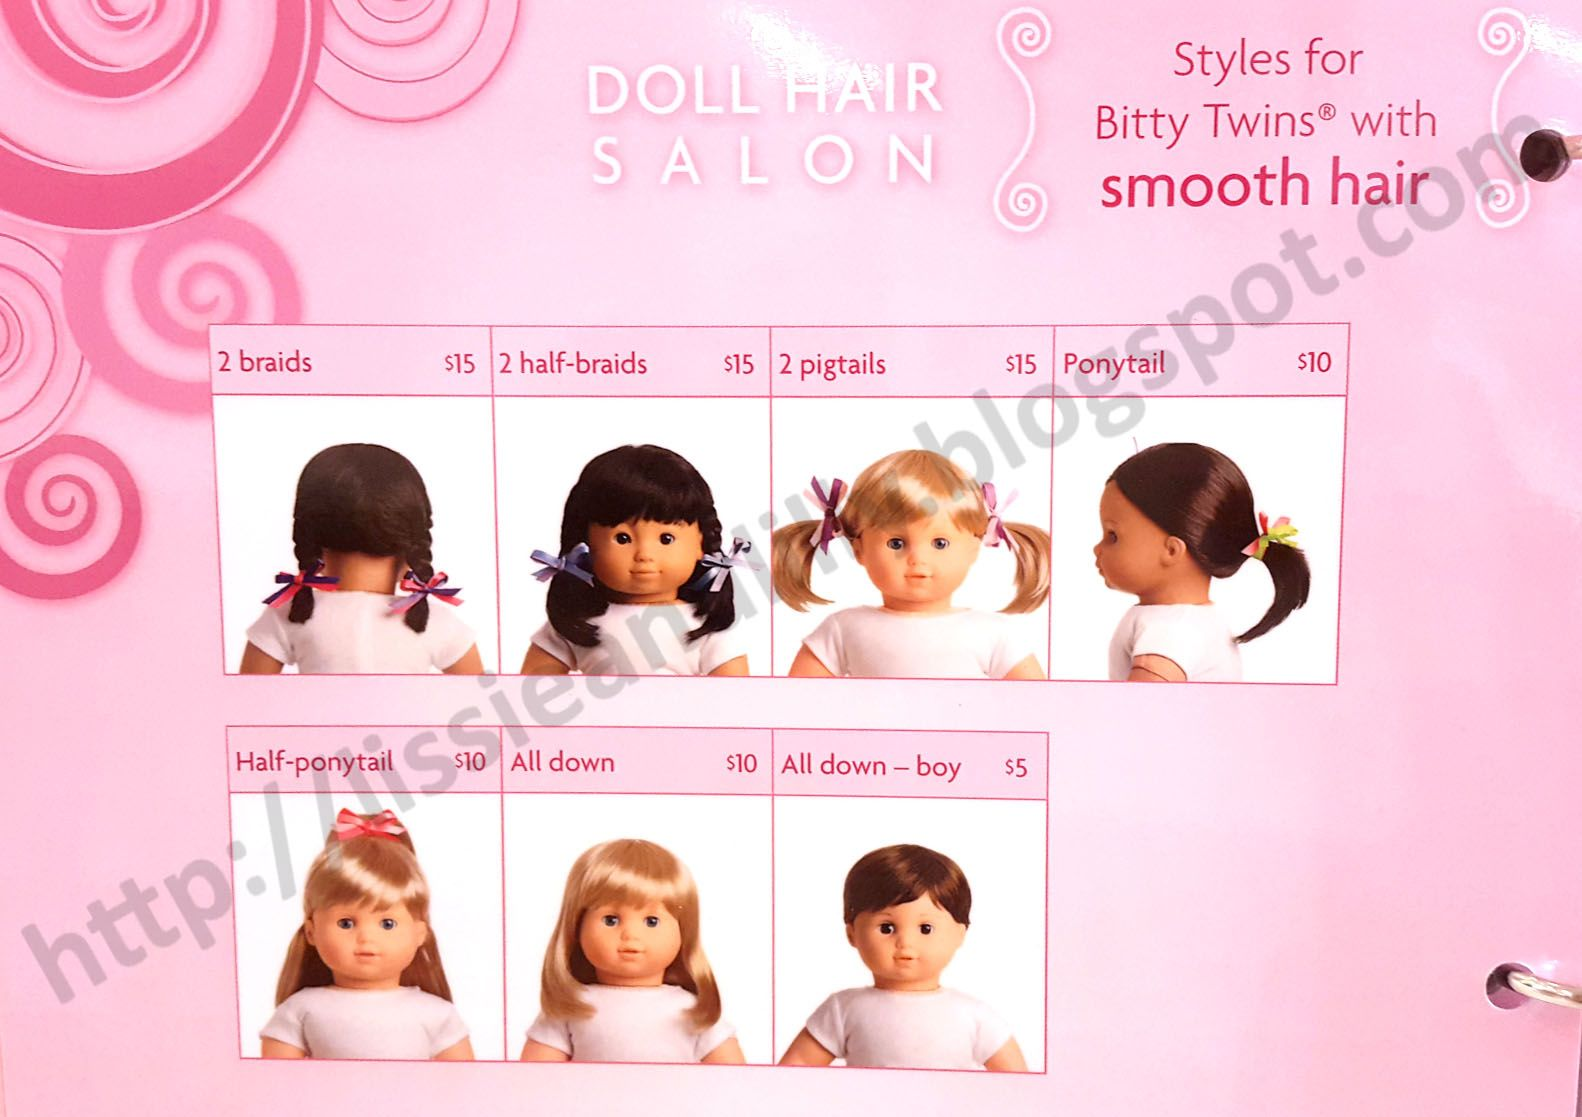 Ag Salon Hairstyles Hair Salon American Girl Hairstyles Ag Hair Products